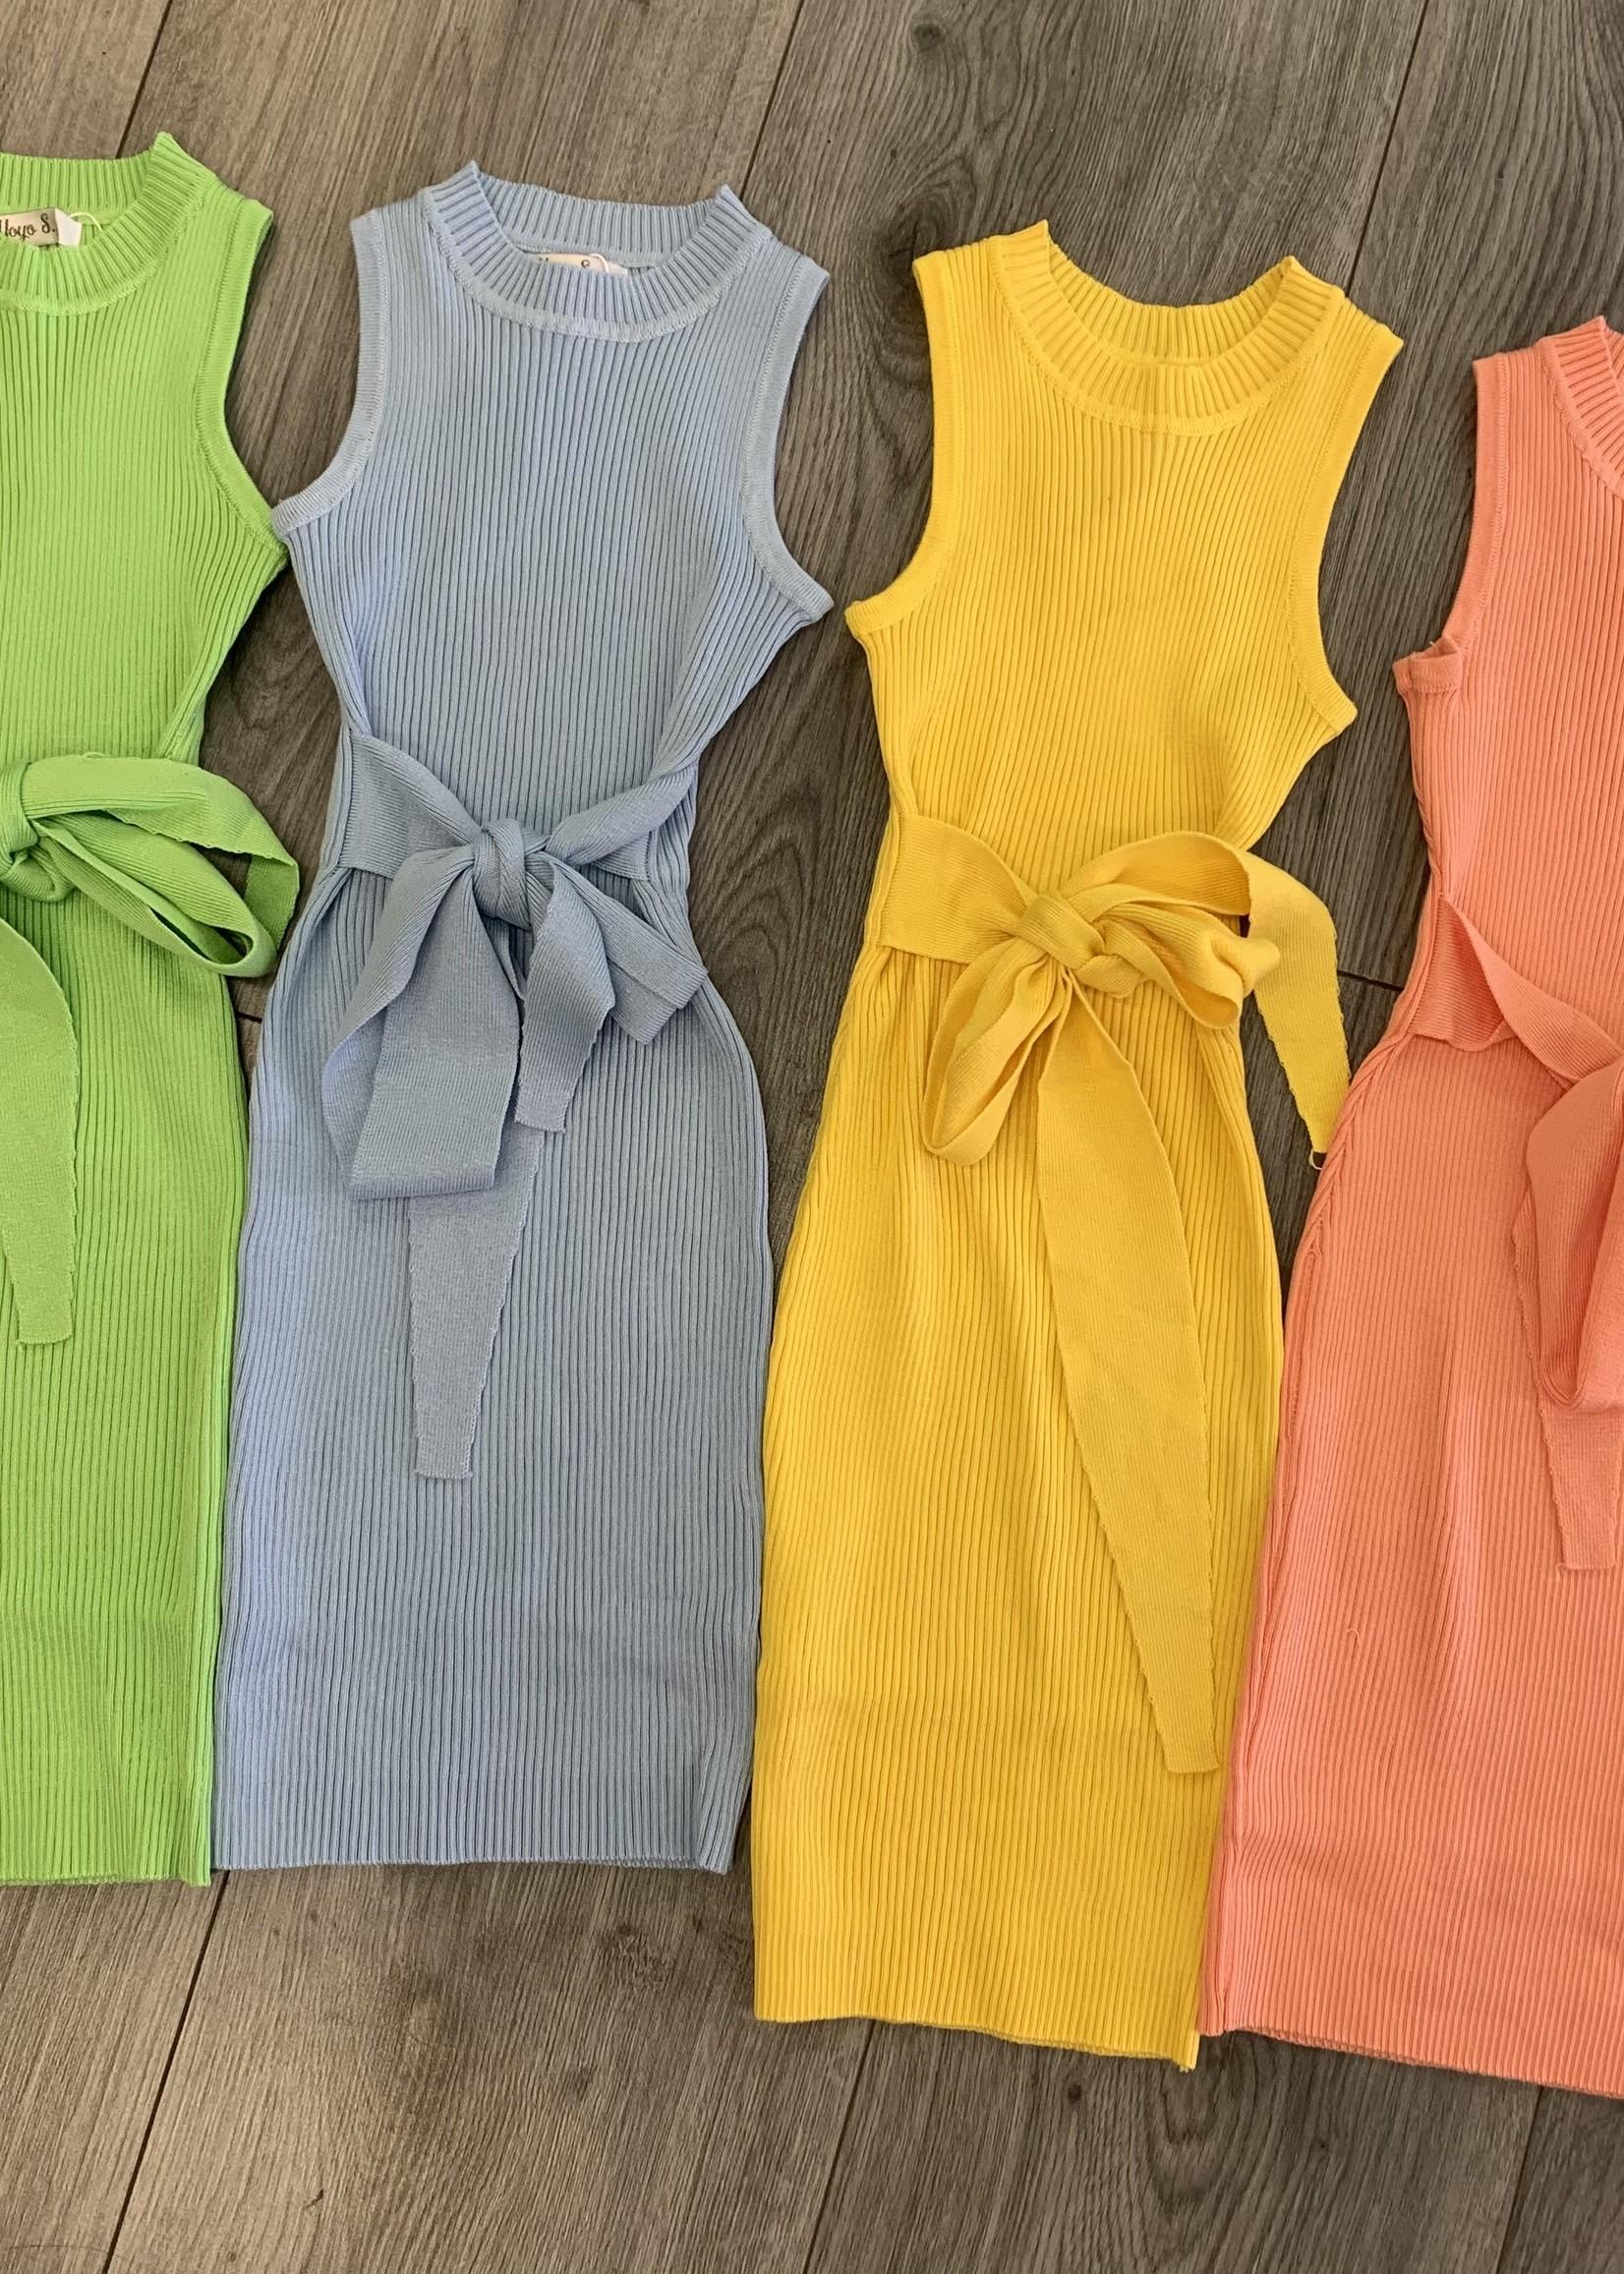 Divanis Divanis knoop jurk groen